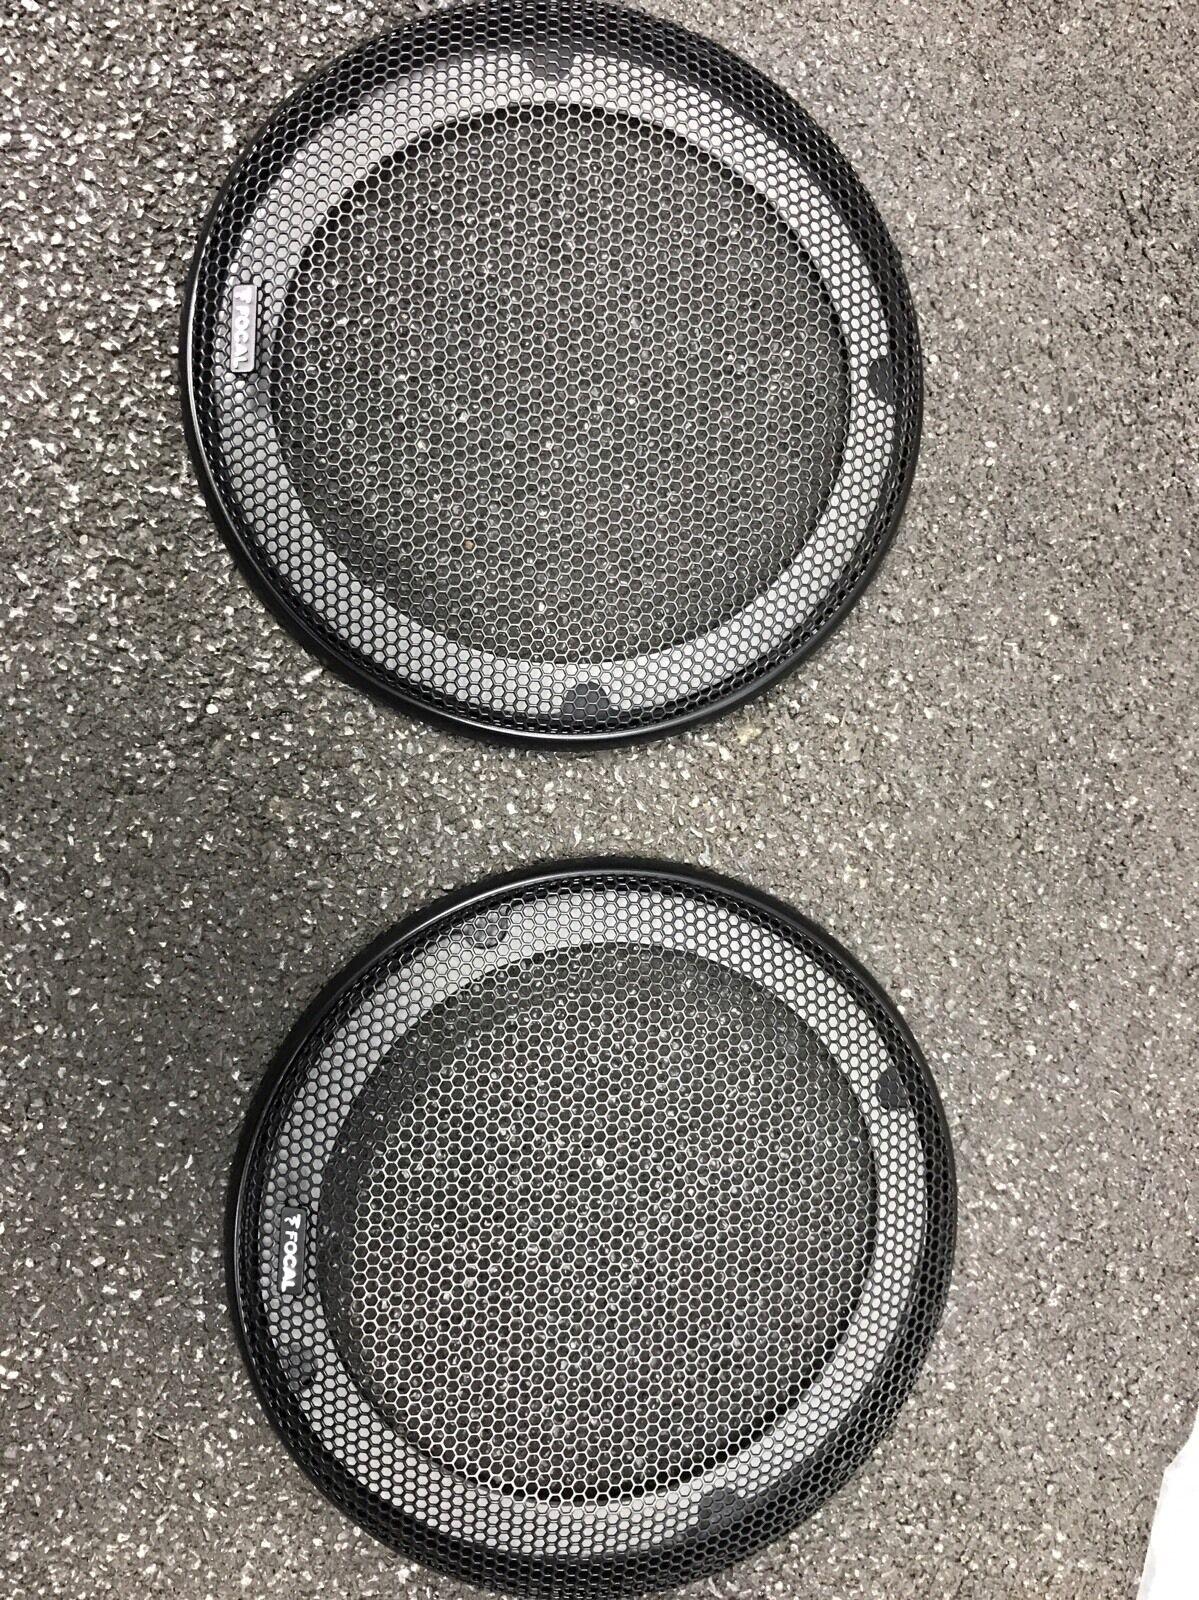 Sonstige Autoentertainment NVX XGR69 6x9 Speaker Grills